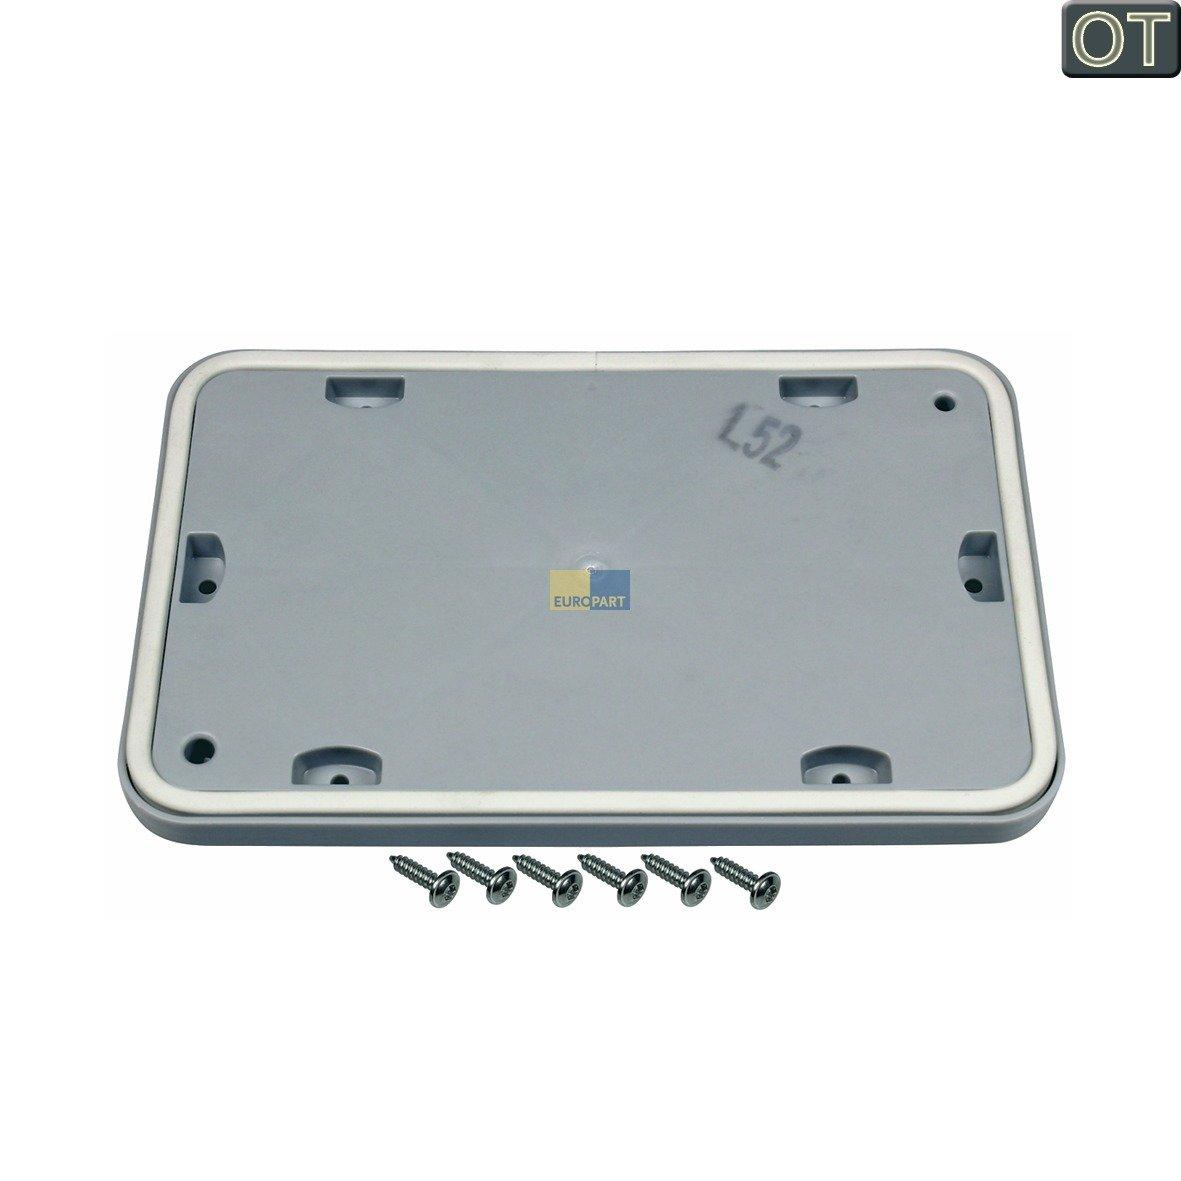 Manutenzione Patta Patta Service porta asciugatrice Bosch Siemens 646776 Sonstige